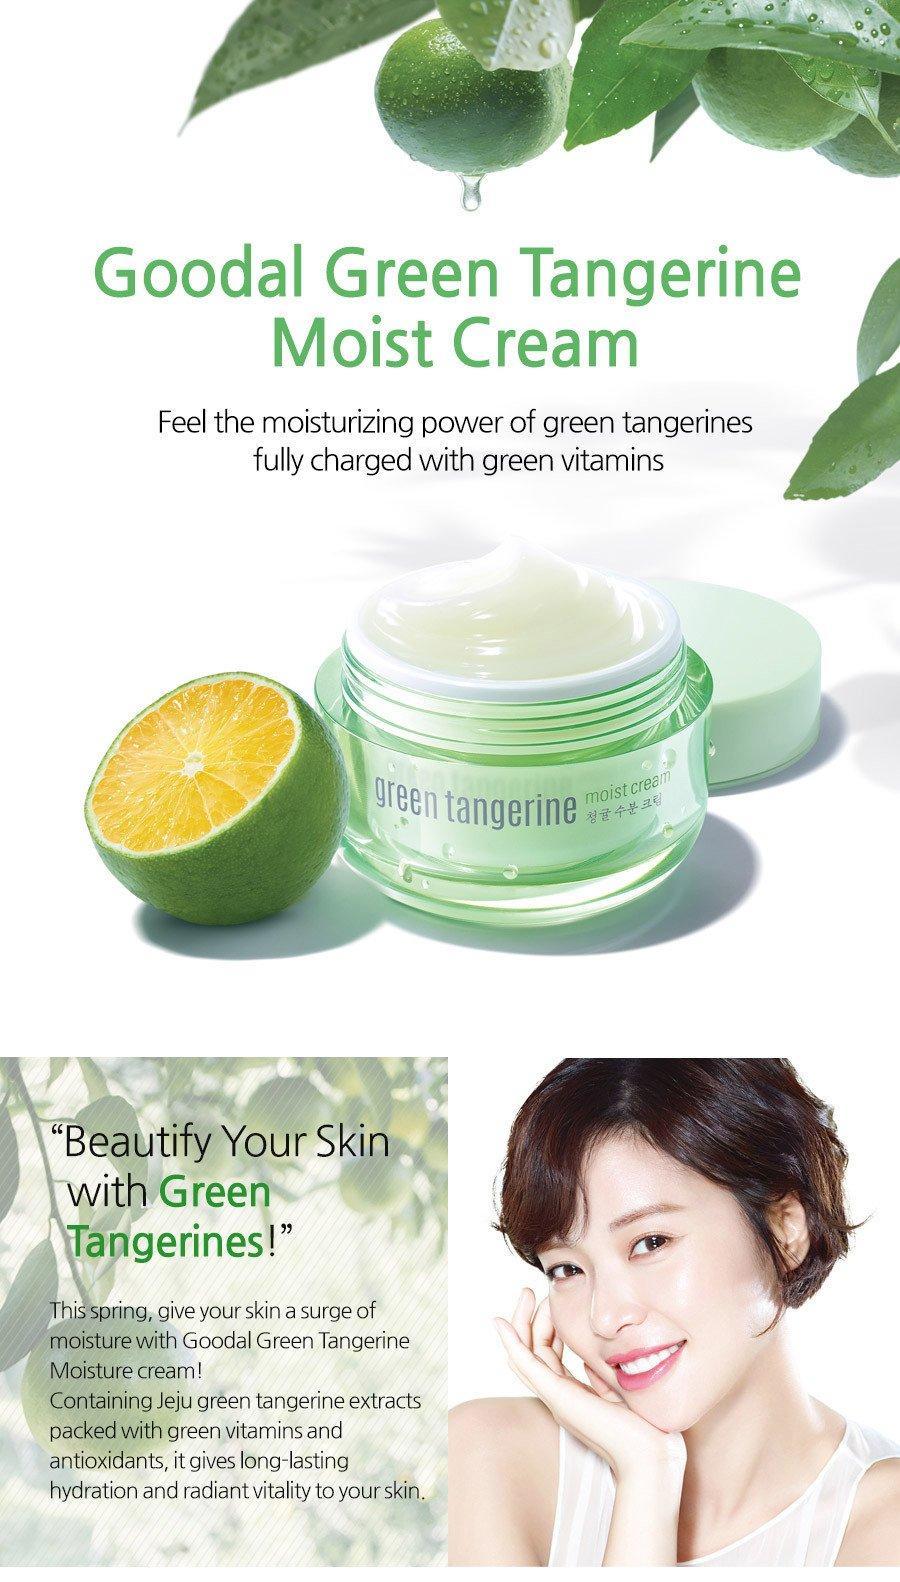 GOODAL_Green_Tangerine_Moist_Cream_features.jpg